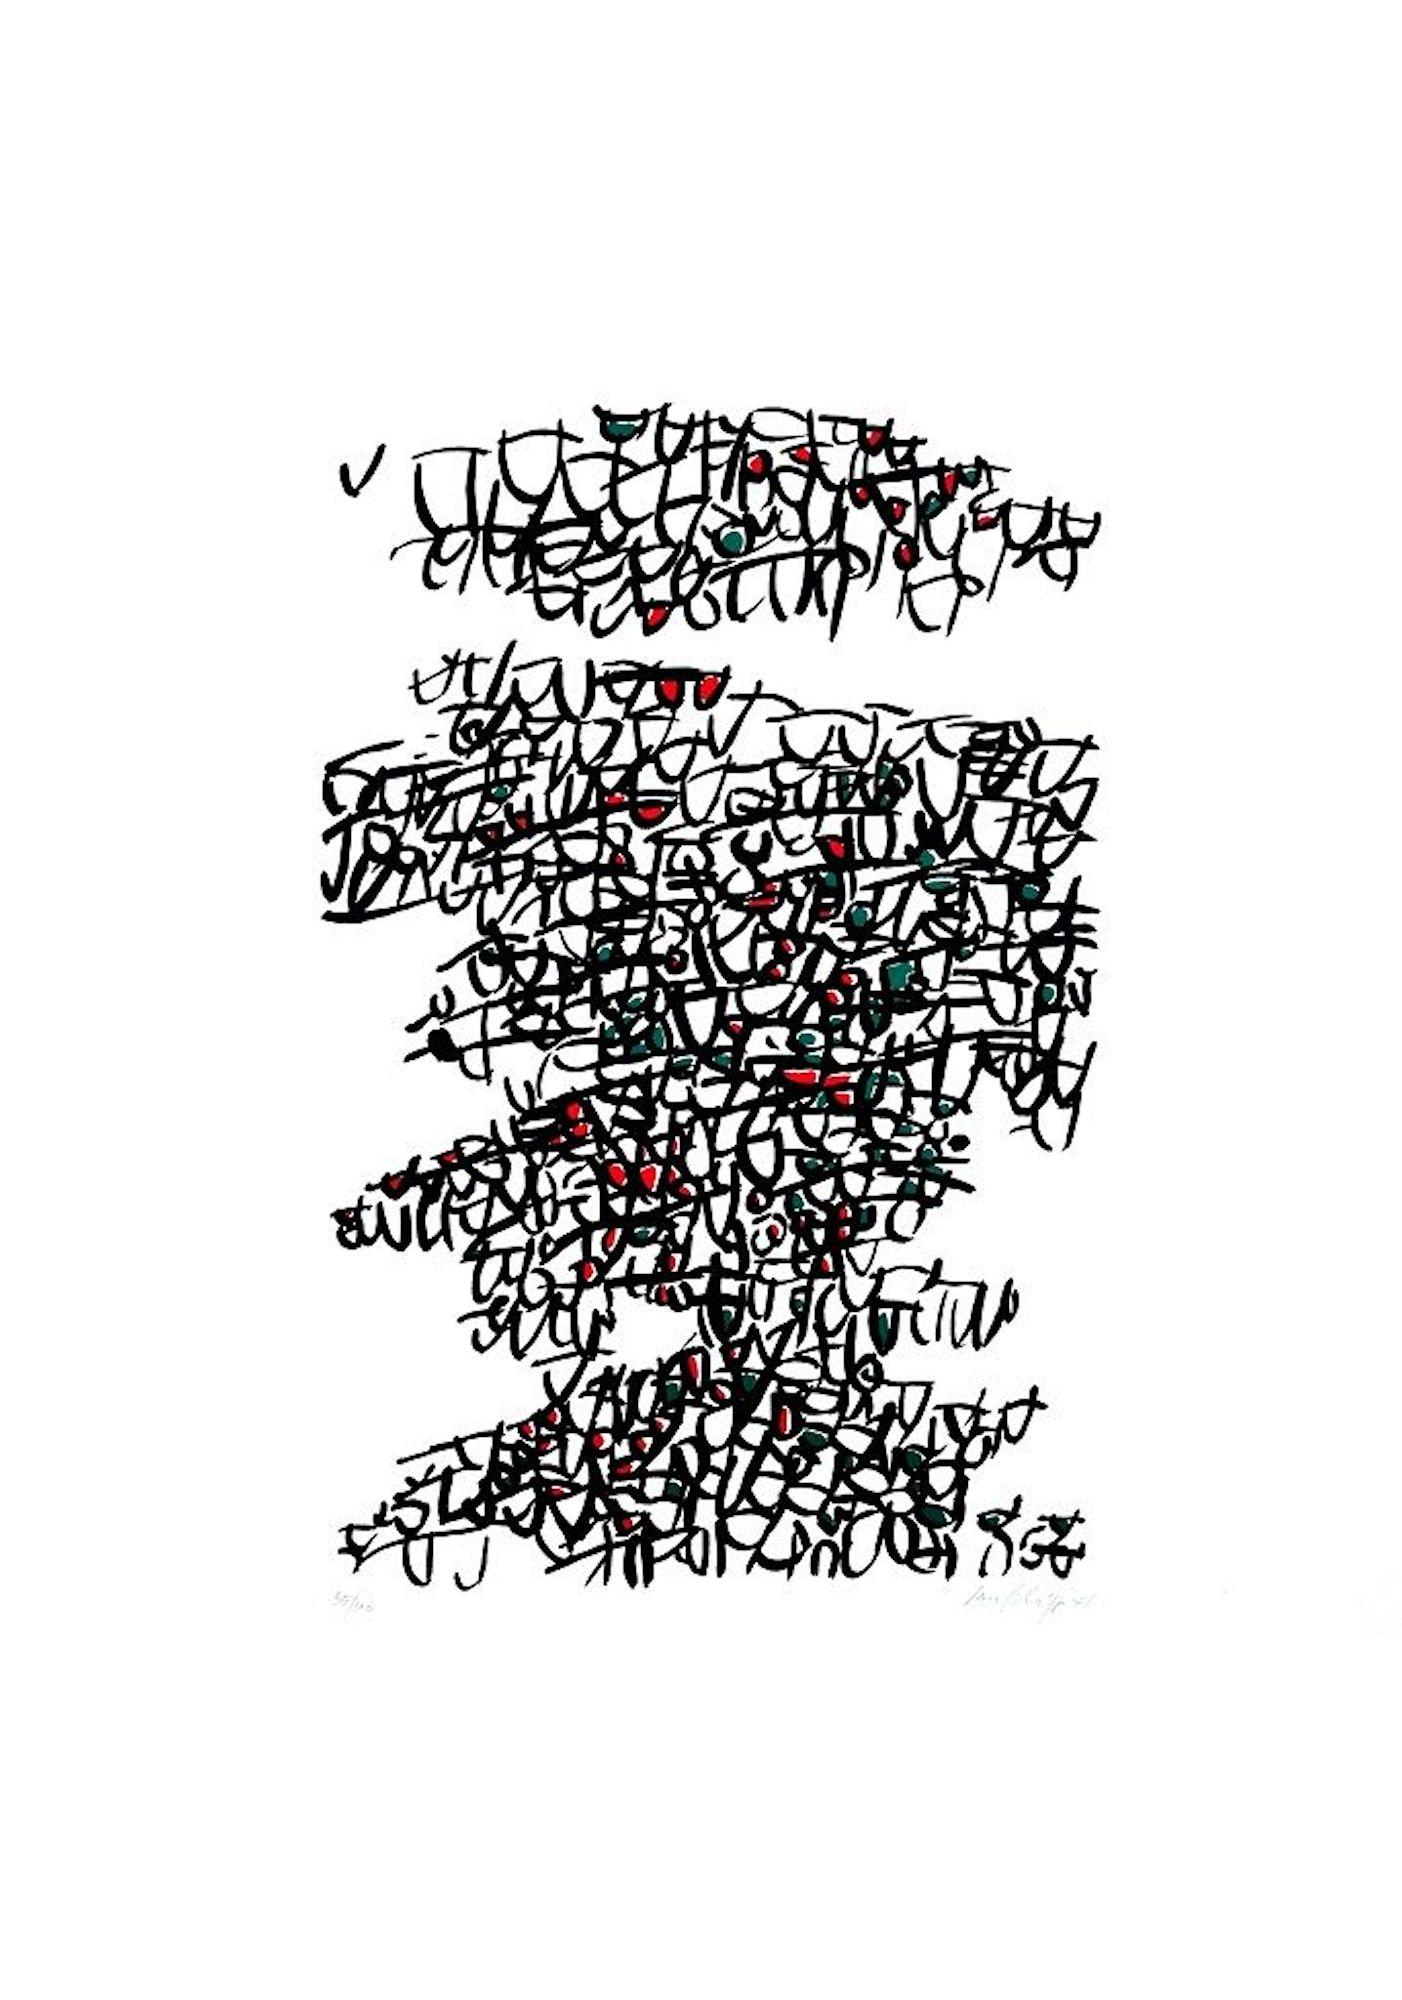 Abstract Composition - Original Lithograph by Antonio Sanfilippo - 1971